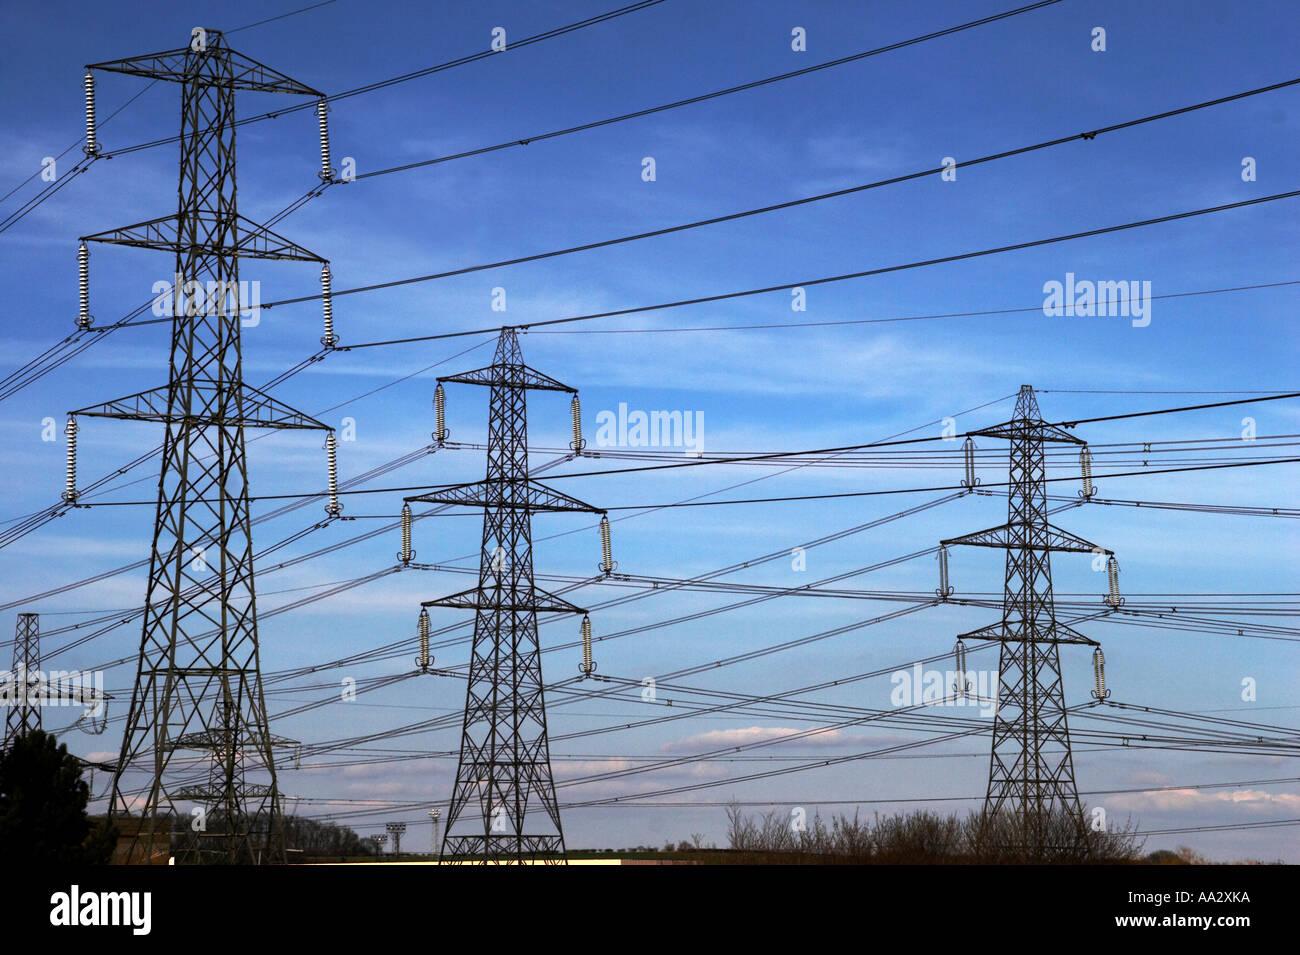 electric pylons powerlines - Stock Image